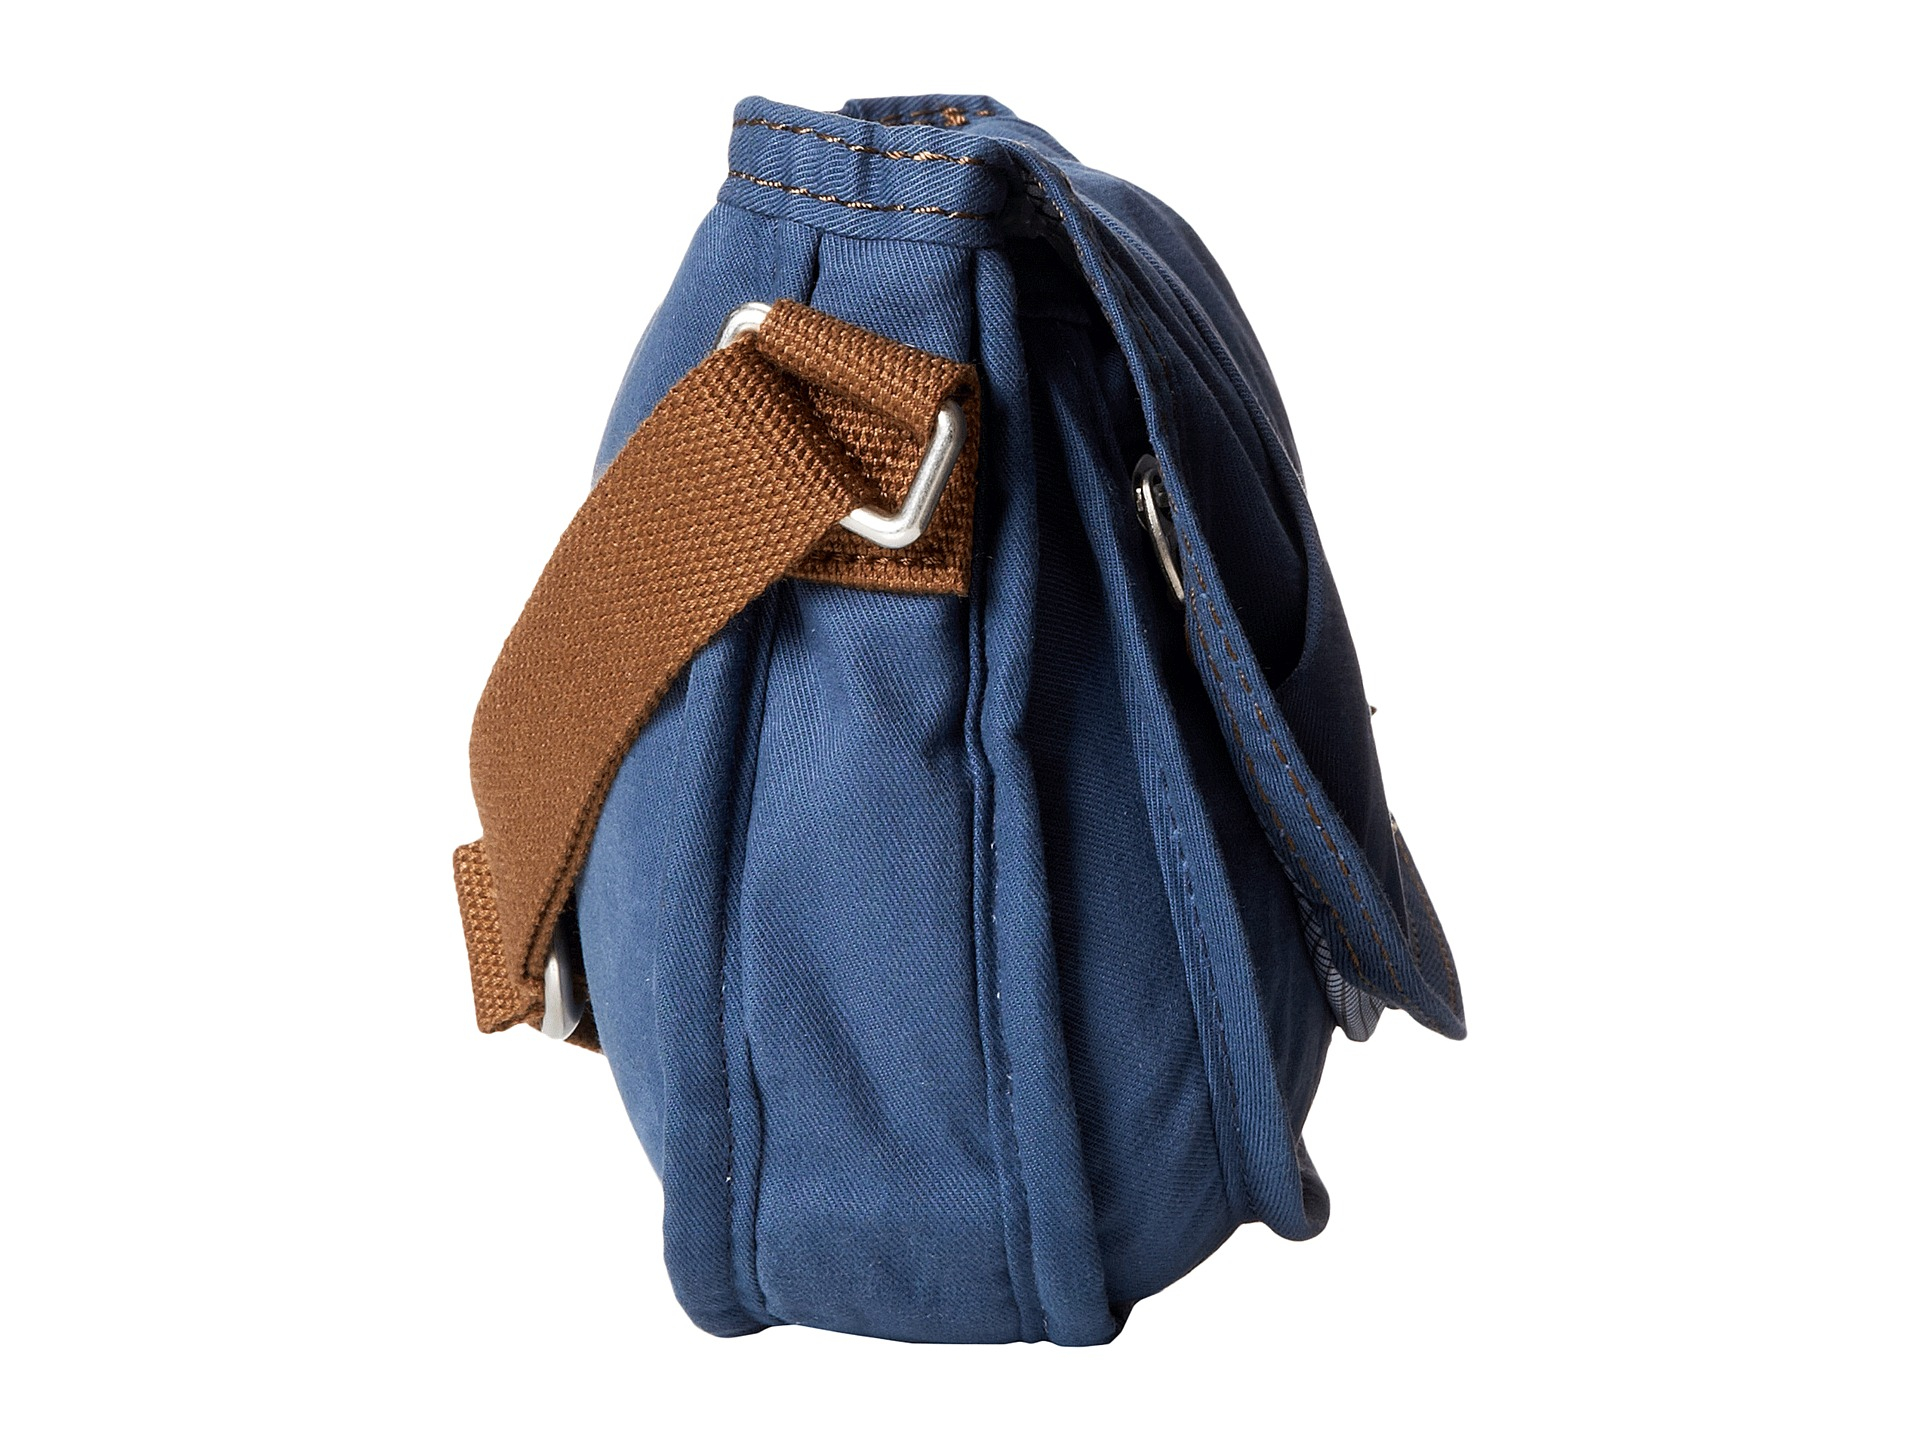 d9300a9168b Keen Montclair Mini Bag Brushed Twill in Blue - Lyst